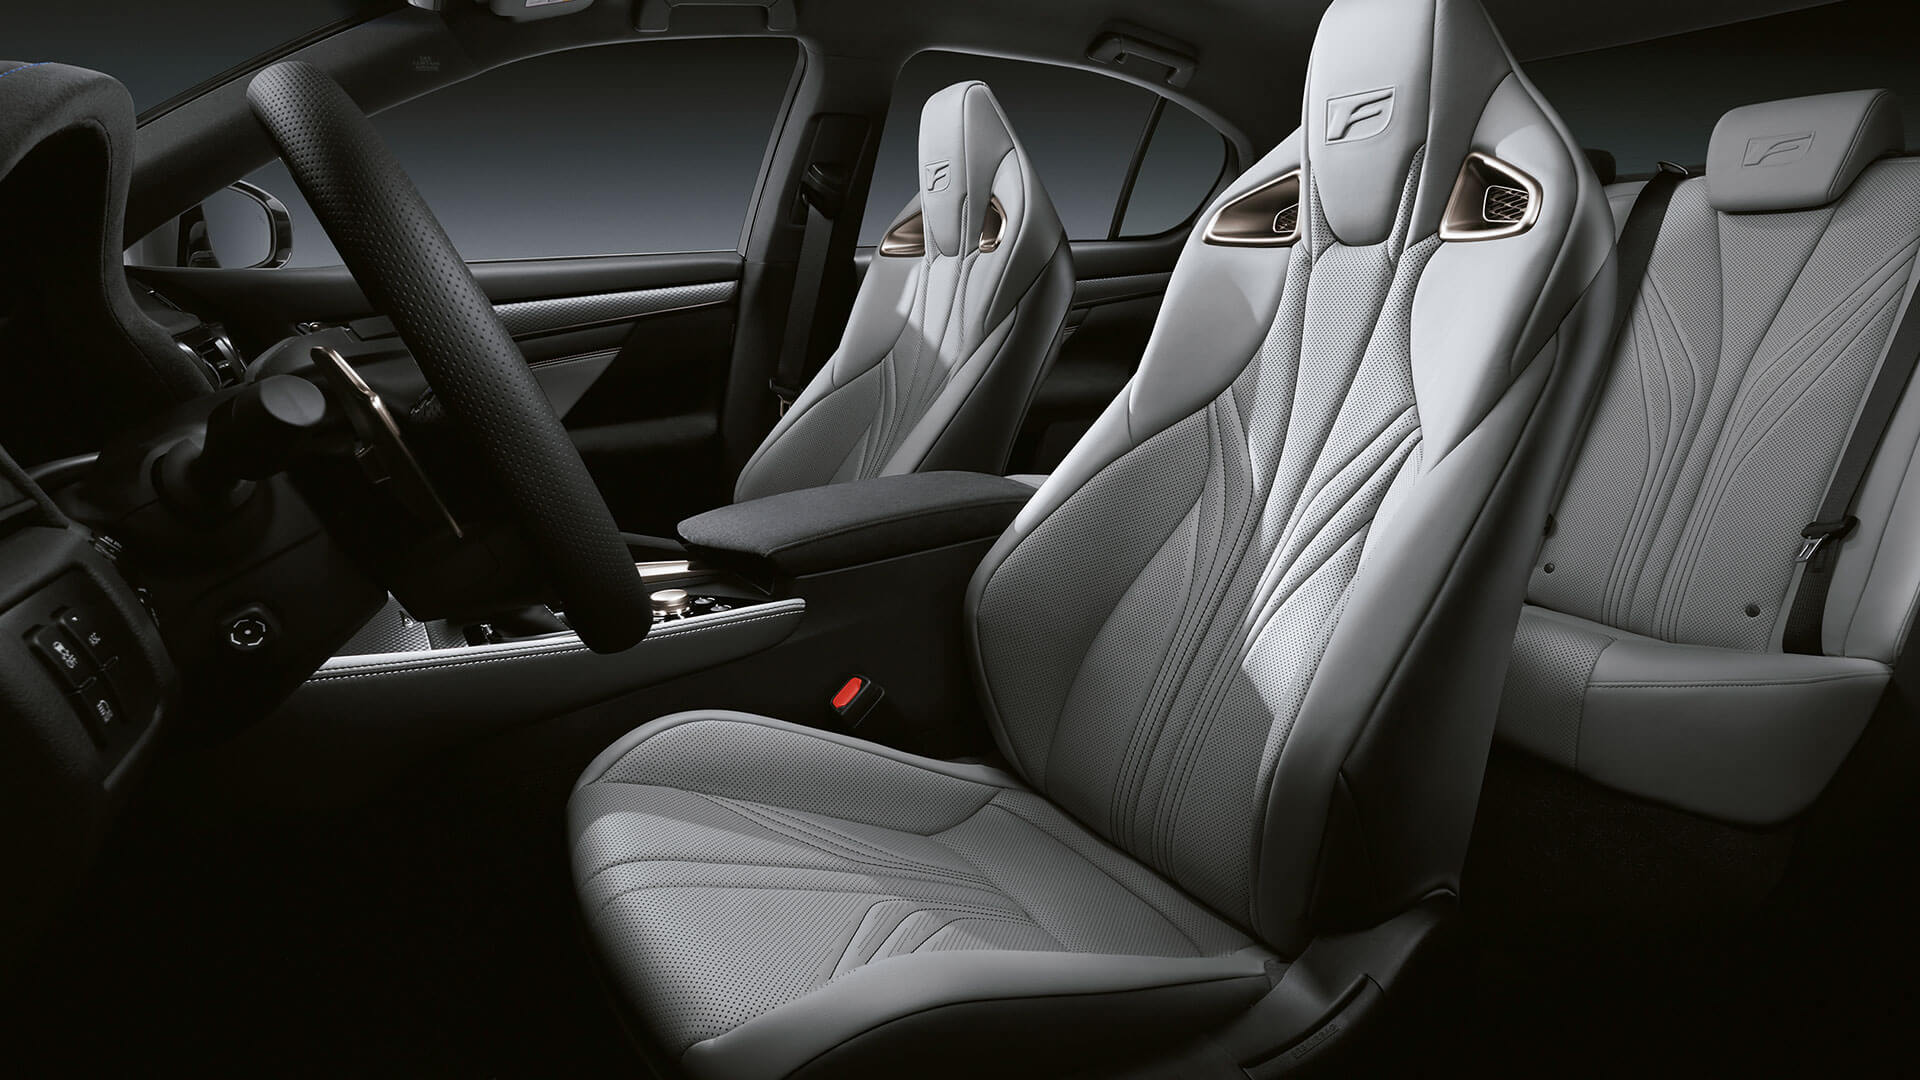 2017 lexus gs f features sports seats